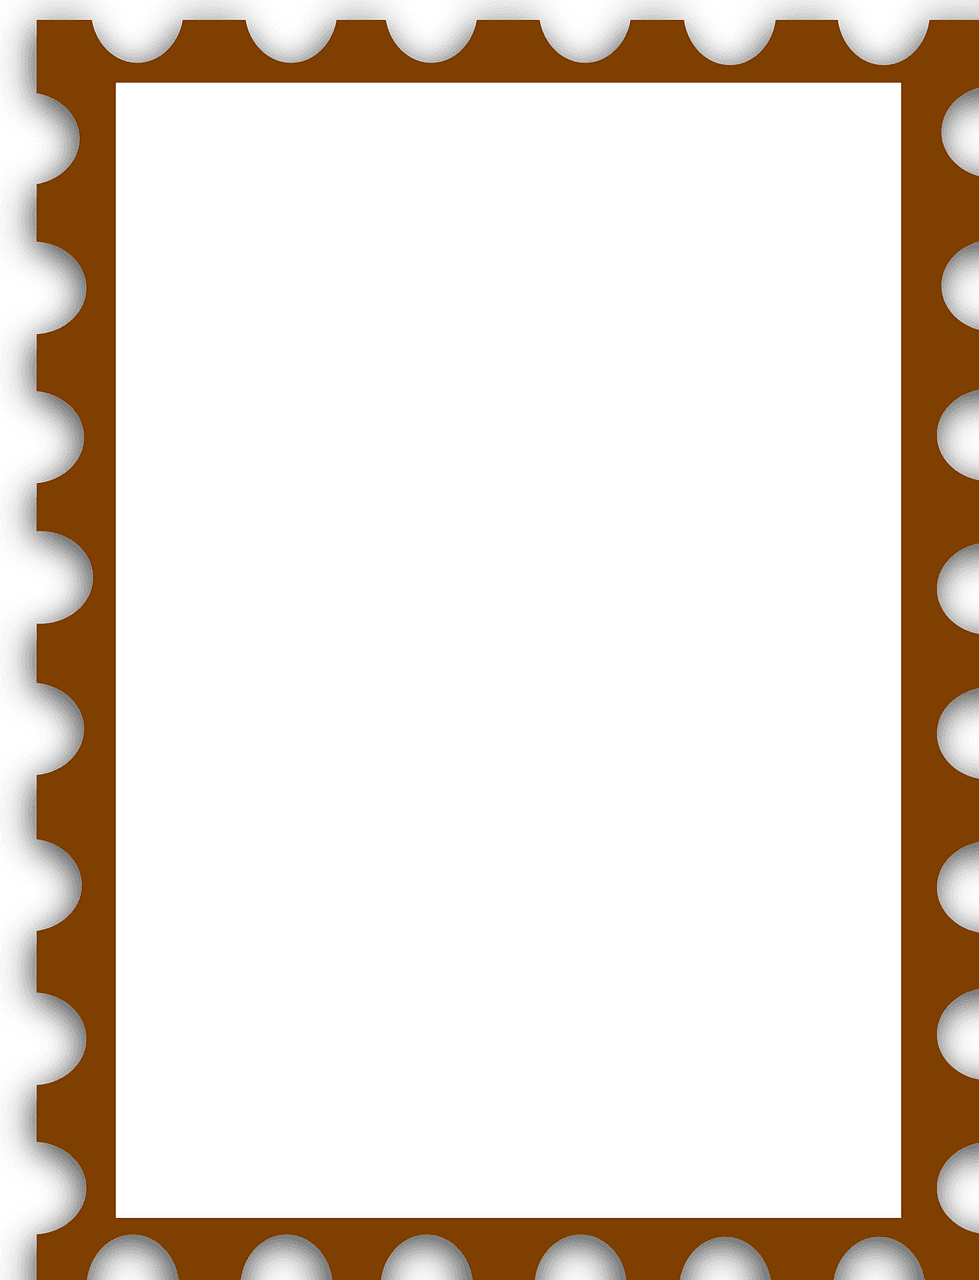 Stamp clipart transparent background 7